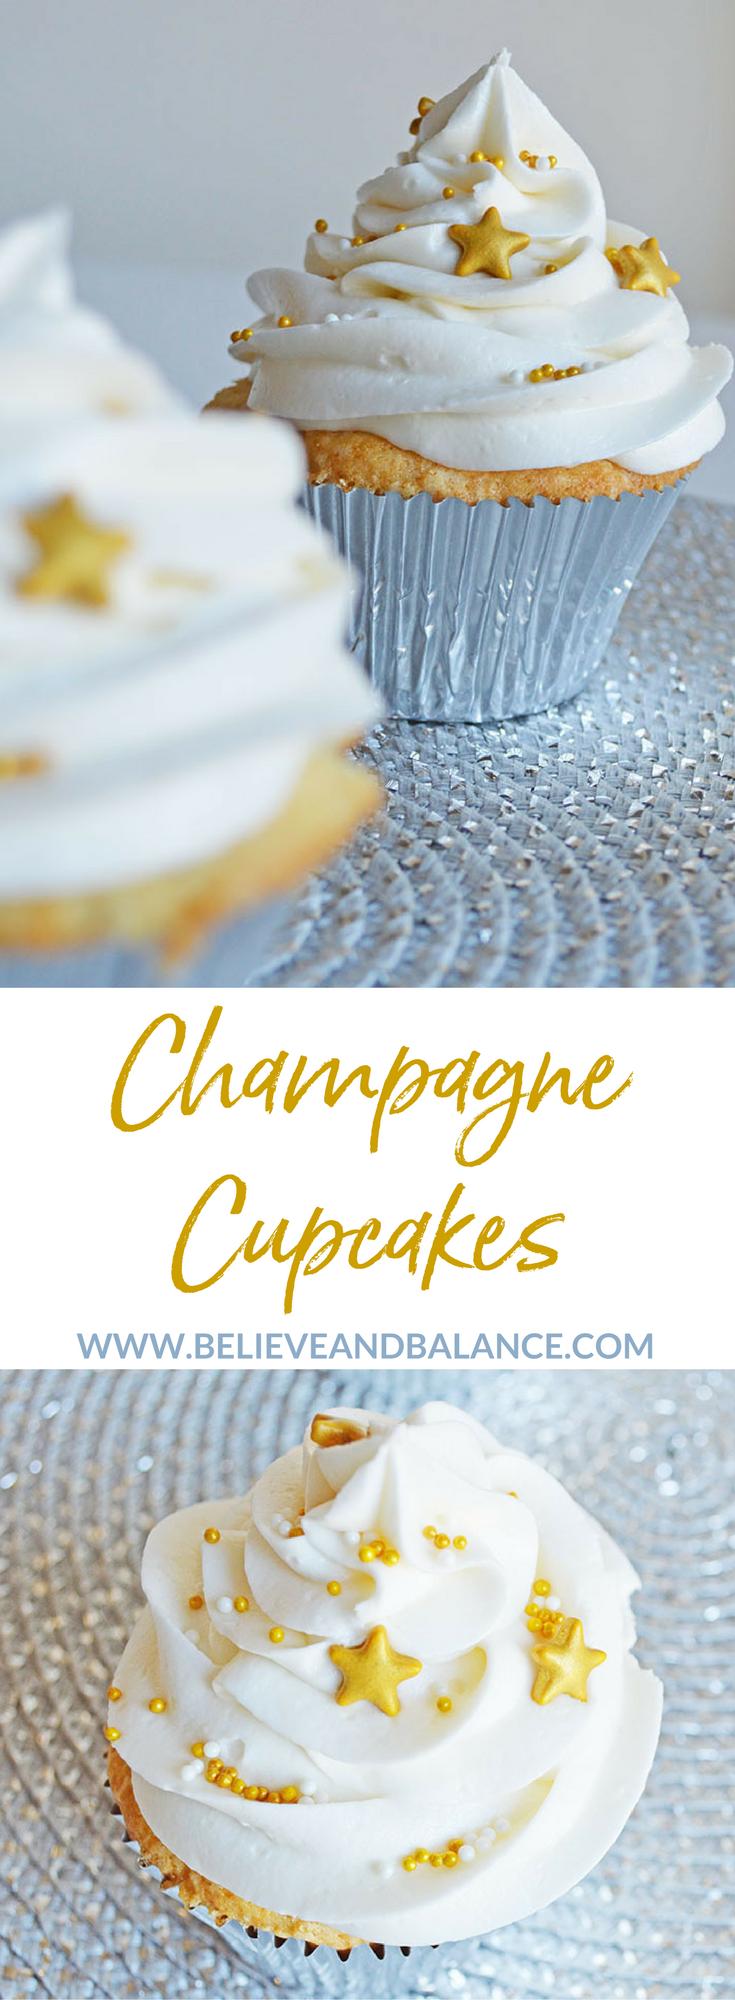 ChampagneCupcakes.png